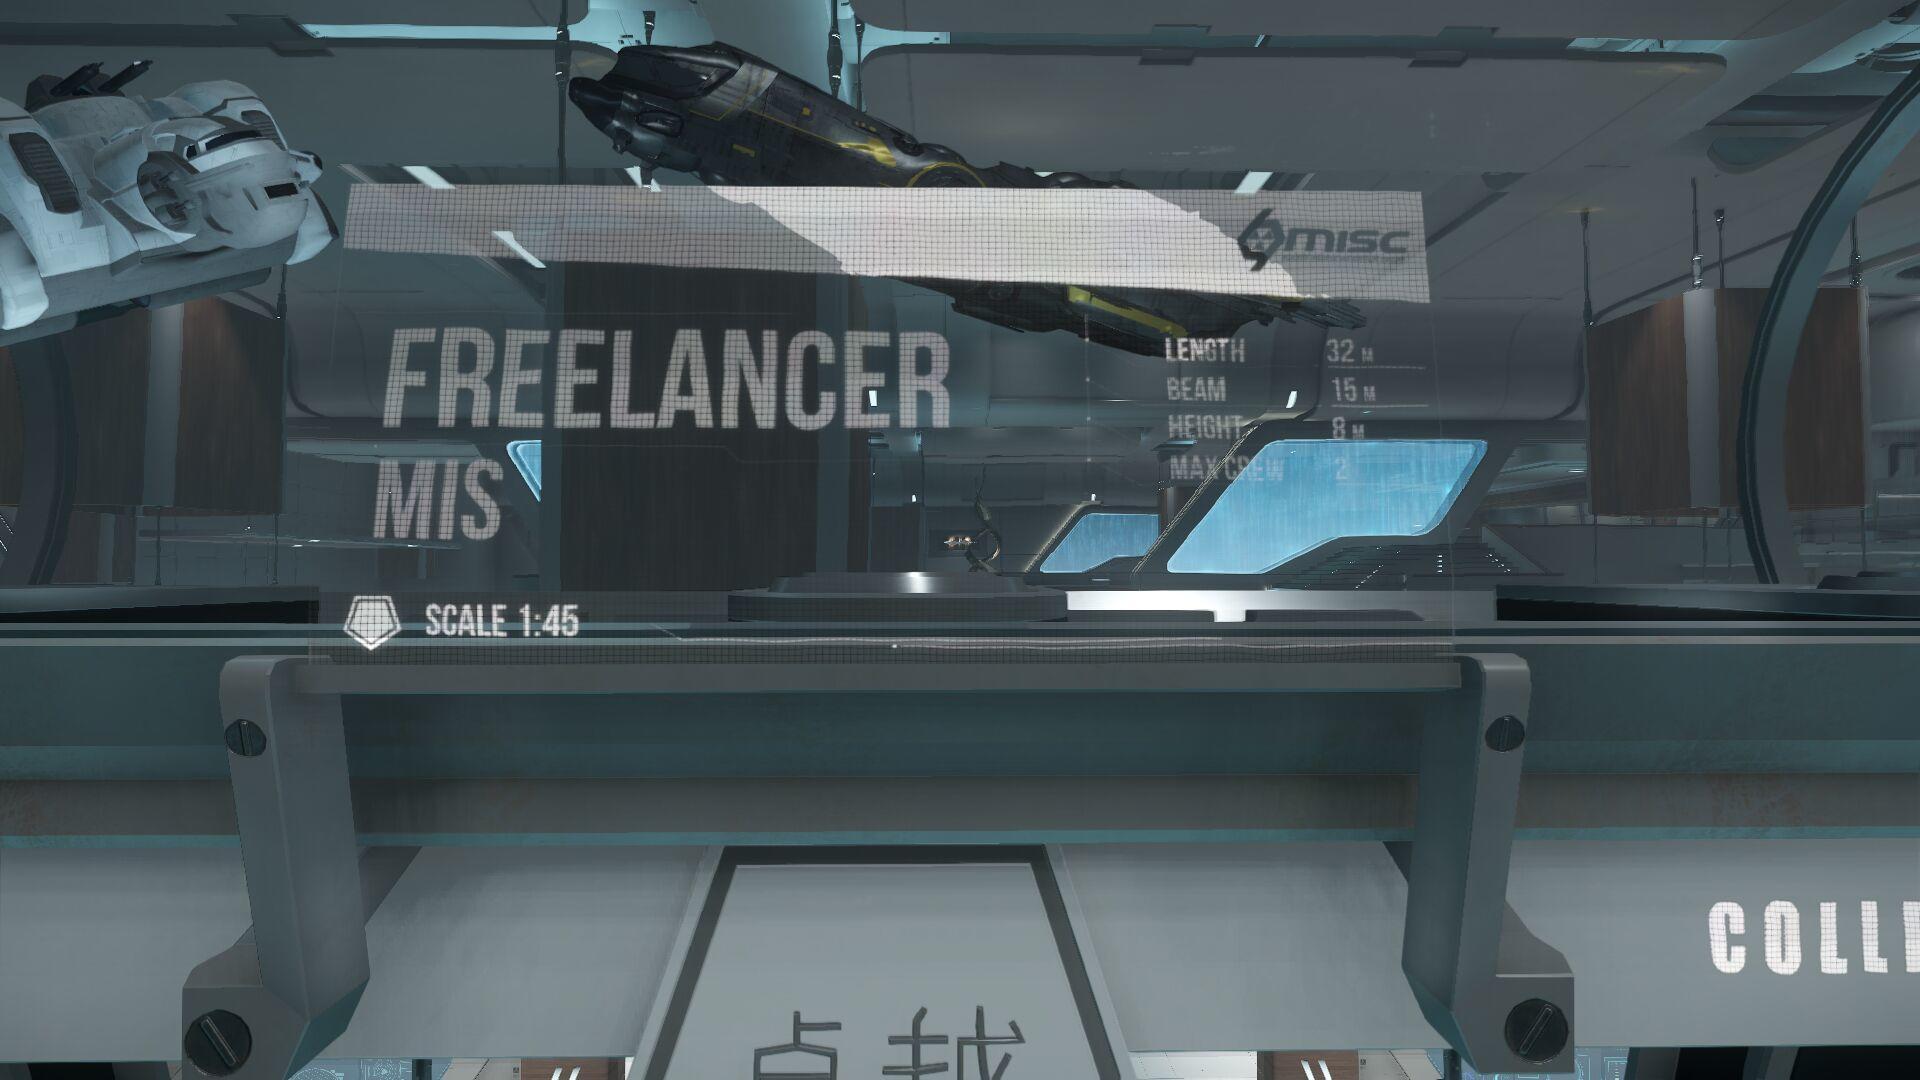 Takuetsu MISC Freelancer MIS